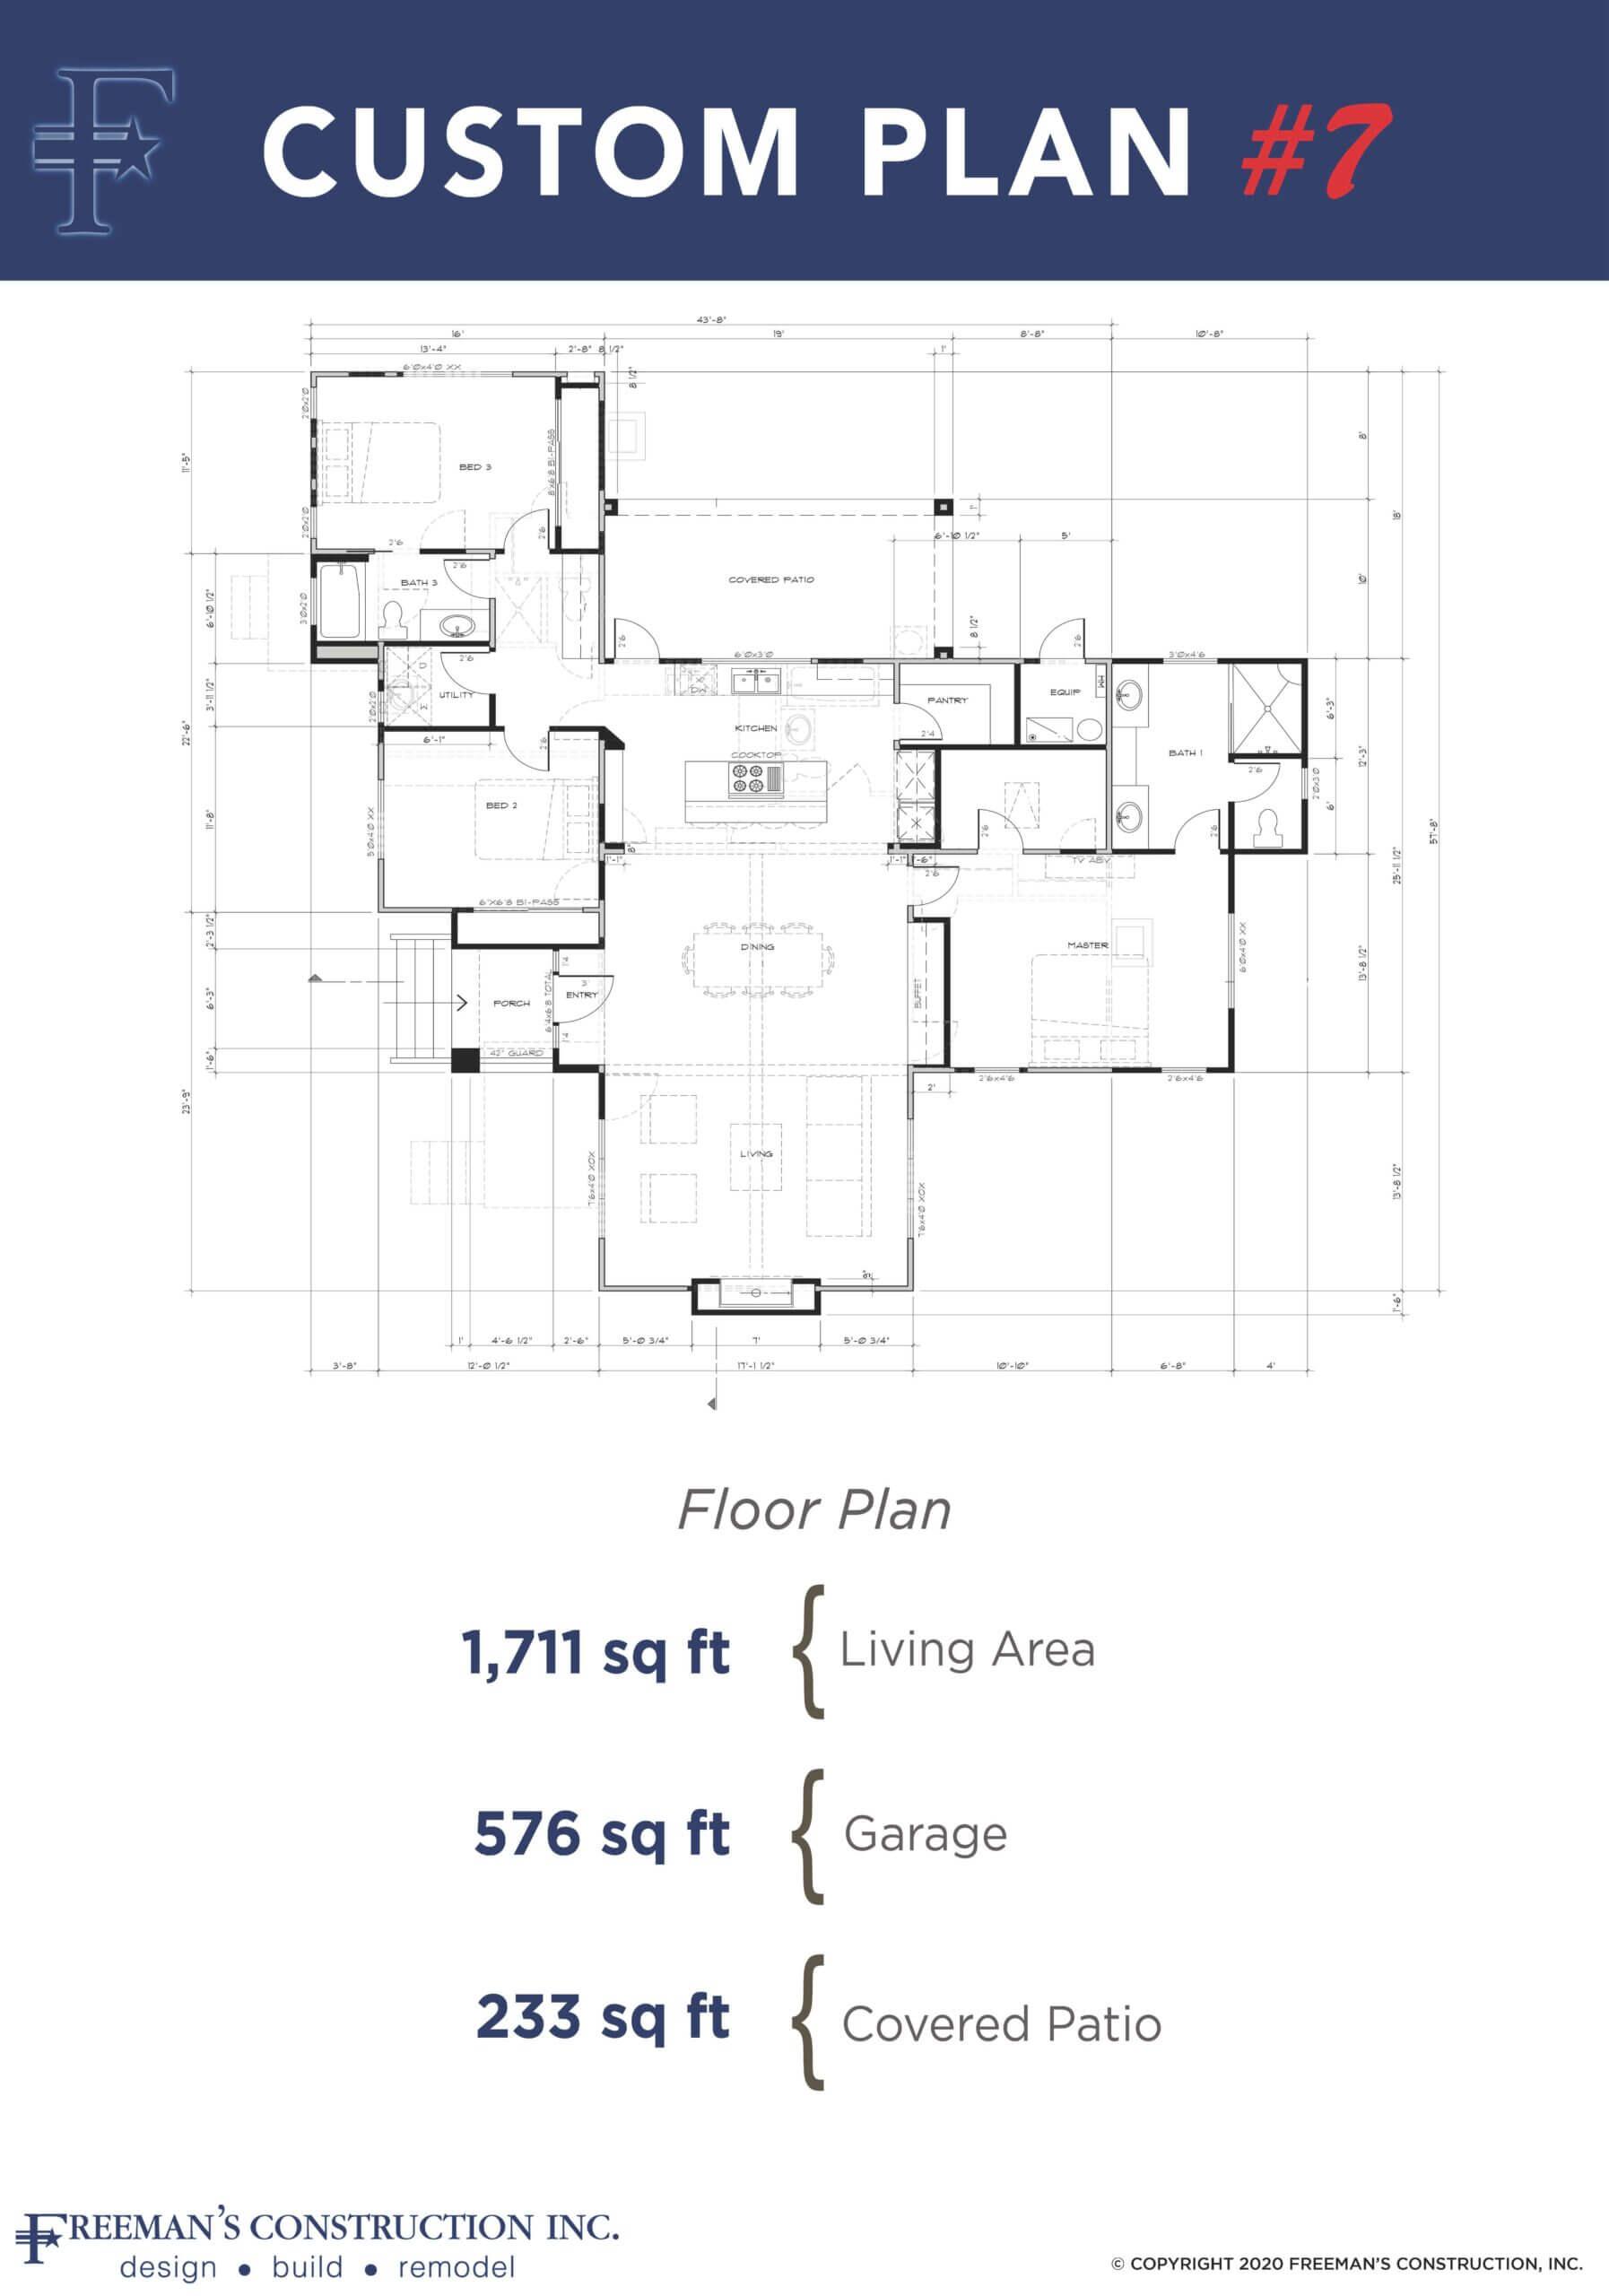 custom-home-floor-plan-7-in-san-diego-county-ca-by-freemans-construction-inc